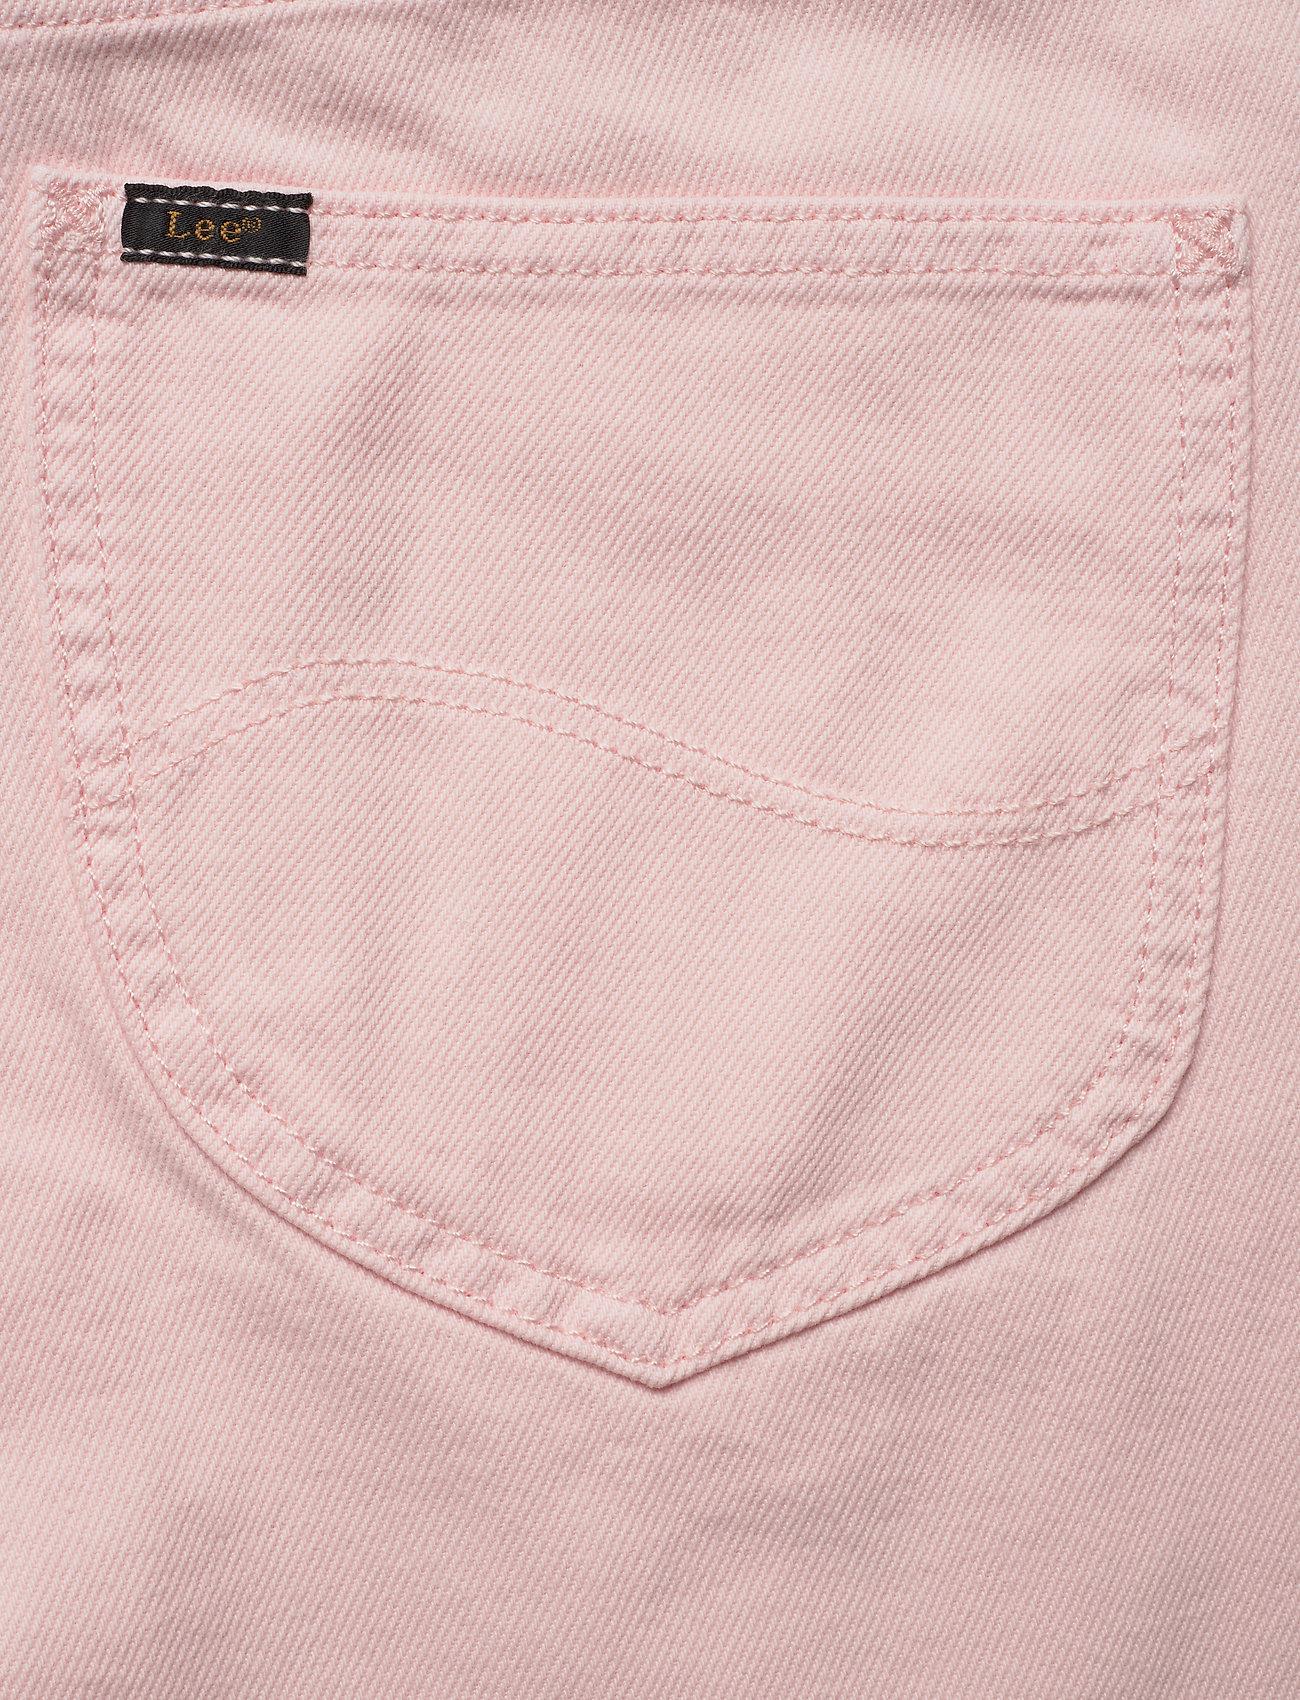 Wide Leg (Crystal Pink) (490 kr) - Lee Jeans i8cNuD03